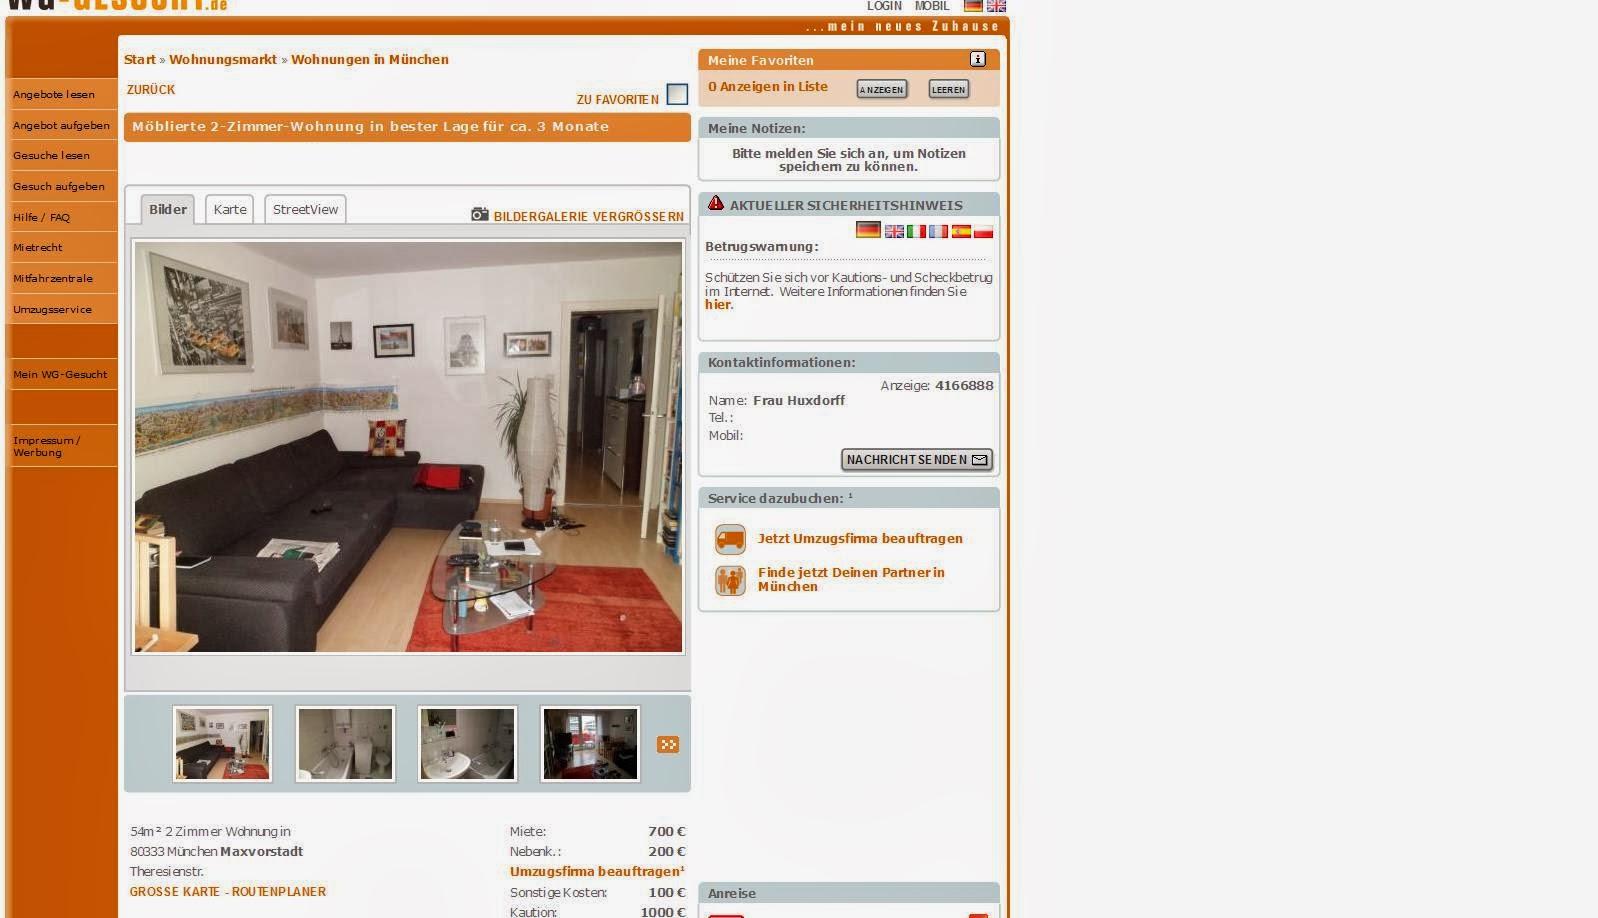 herr dieter 54m 2 zimmer 80333 m nchen maxvorstadt theresien 3. Black Bedroom Furniture Sets. Home Design Ideas